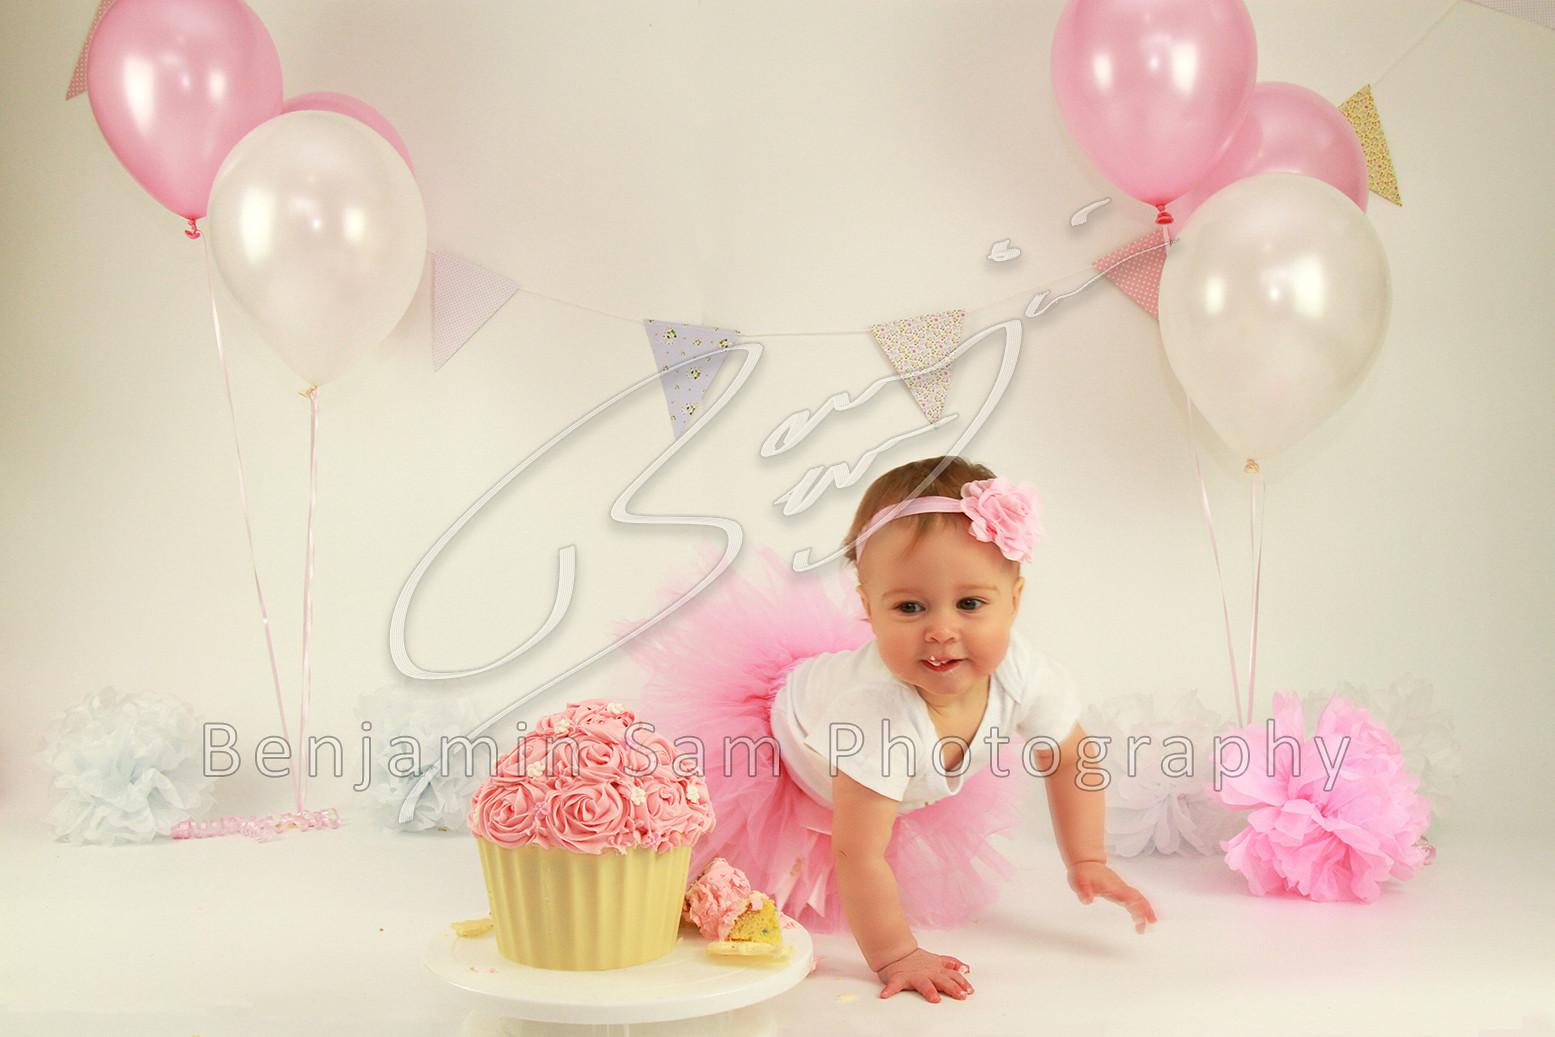 Cake - WM - 019